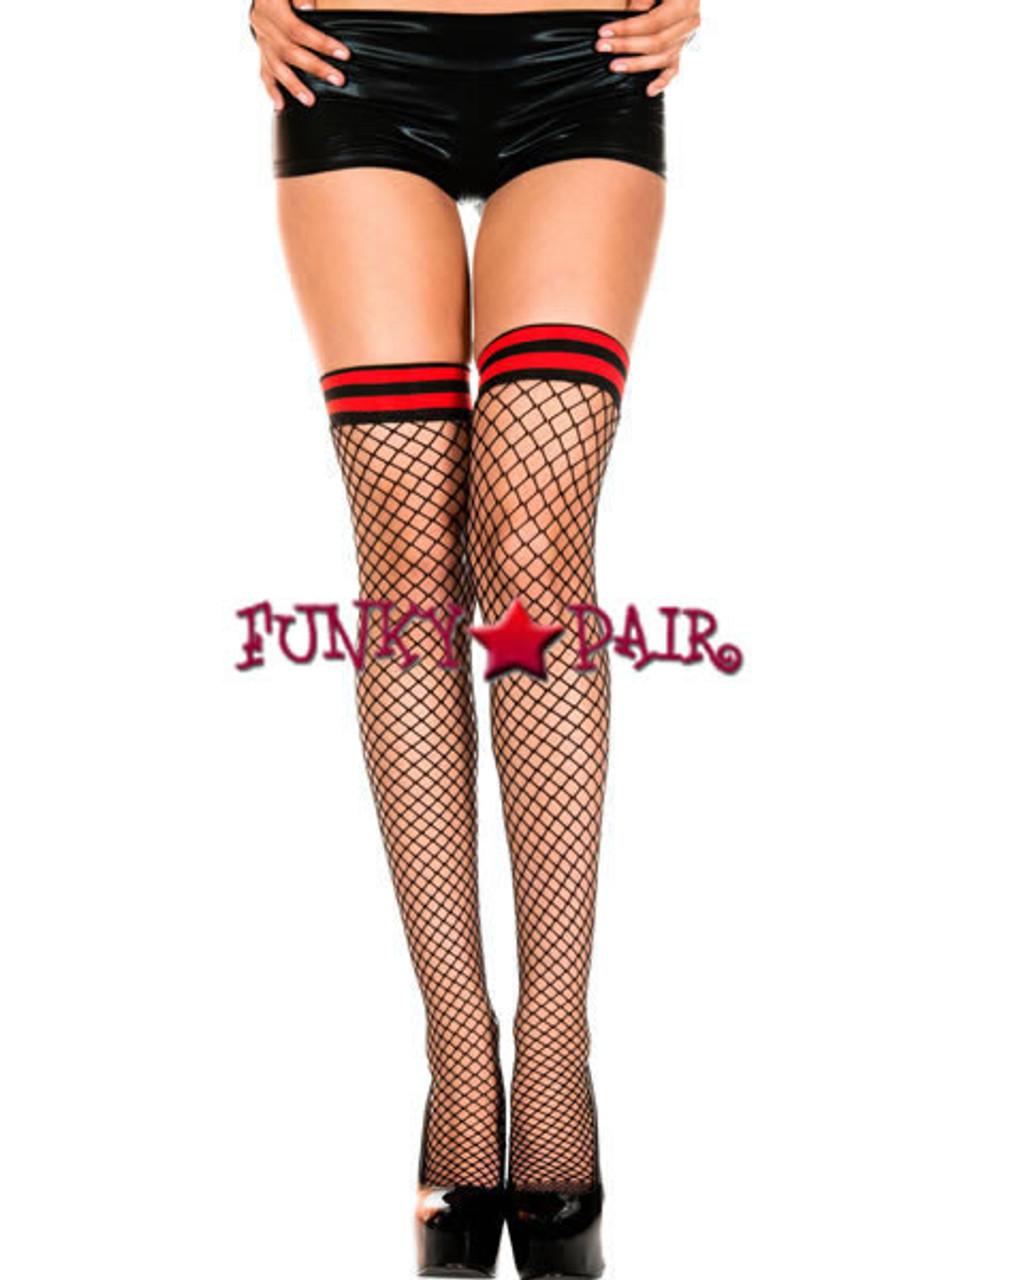 New Music Legs 4844 Double Backseam Fishnet Thigh High Stockings